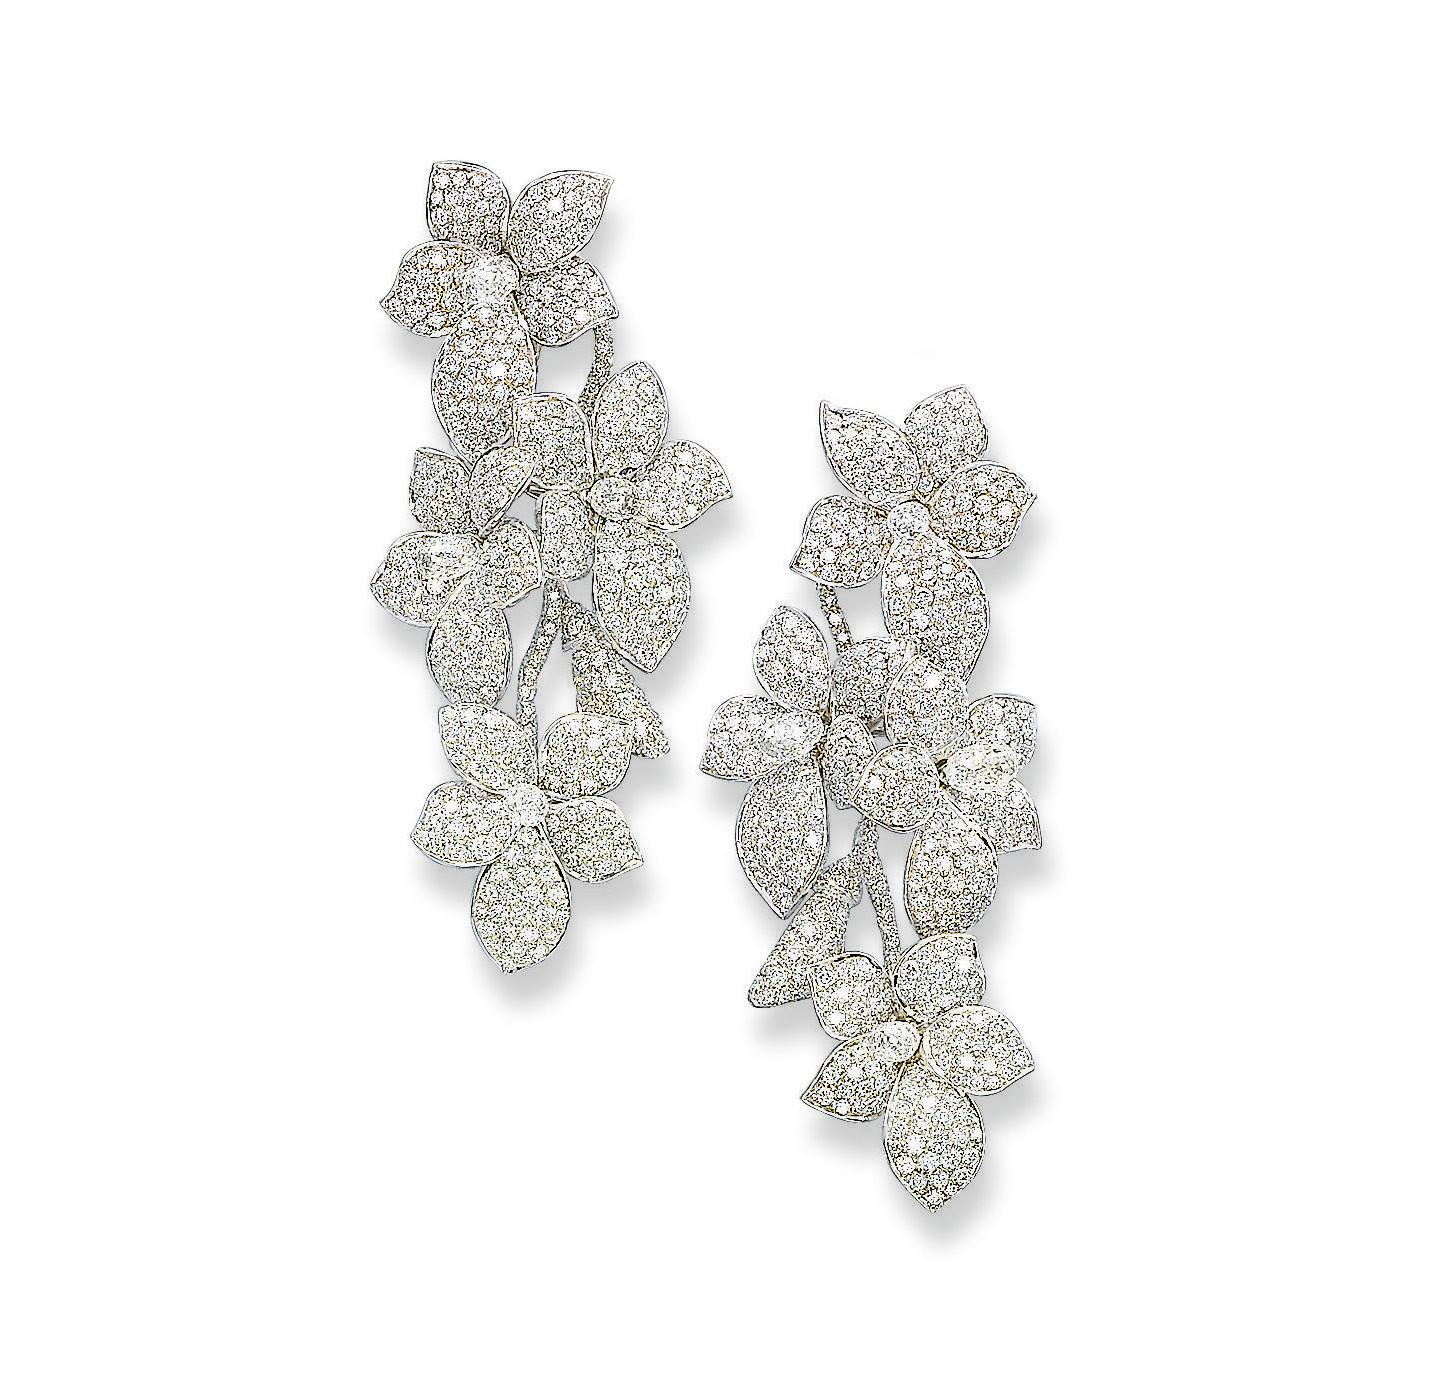 A PAIR OF DIAMOND 'FLOWER' EAR PENDANTS, BY MICHELE DELLA VALLE